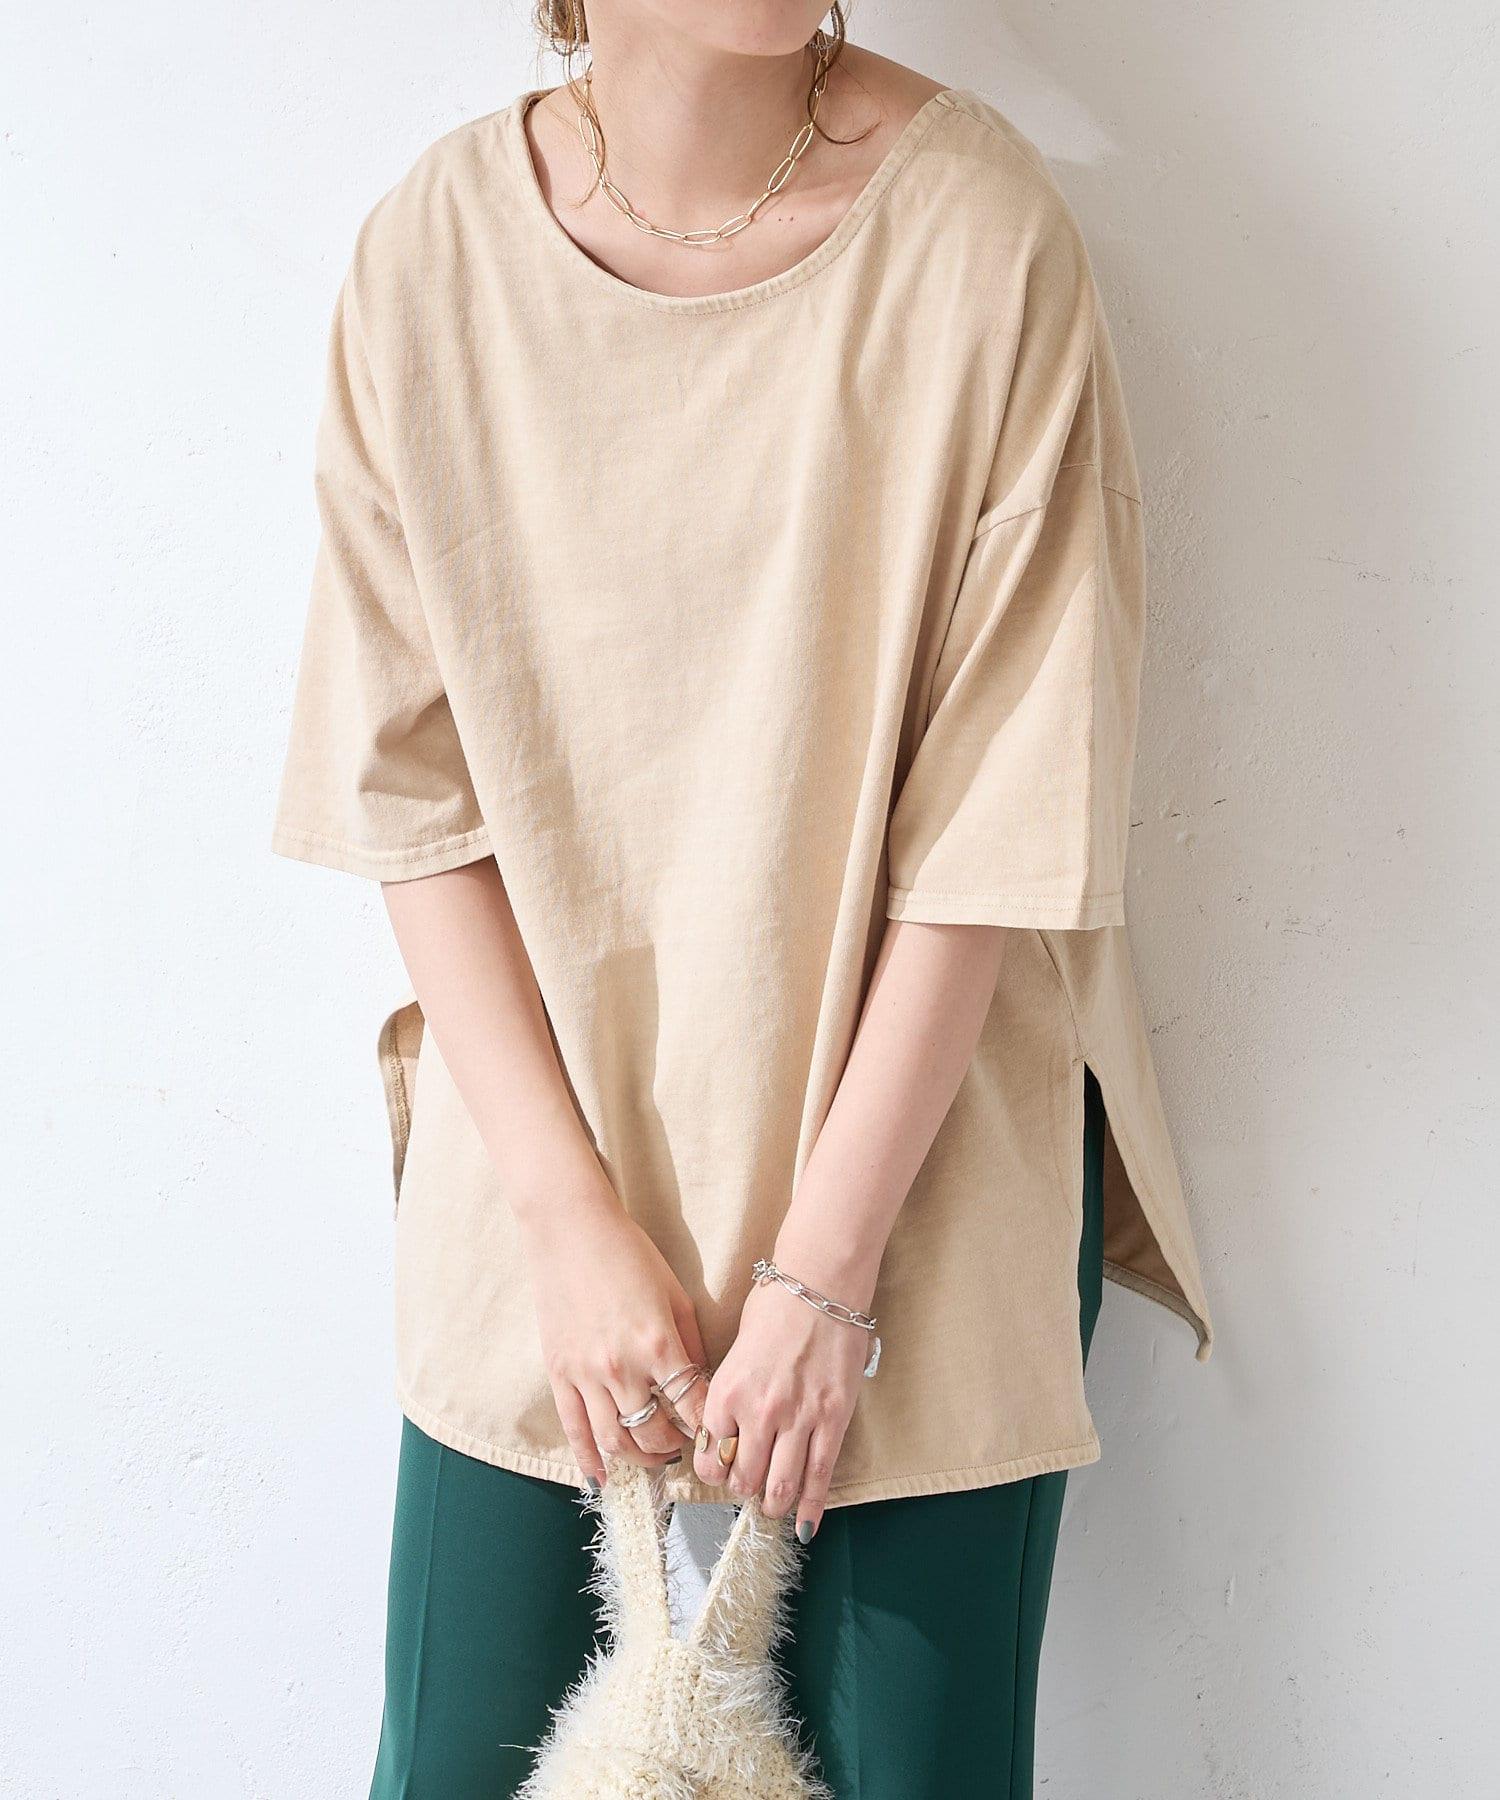 OUTLET(アウトレット) 【Discoat】【ARTEX】バックオープンチュニックロングTシャツ